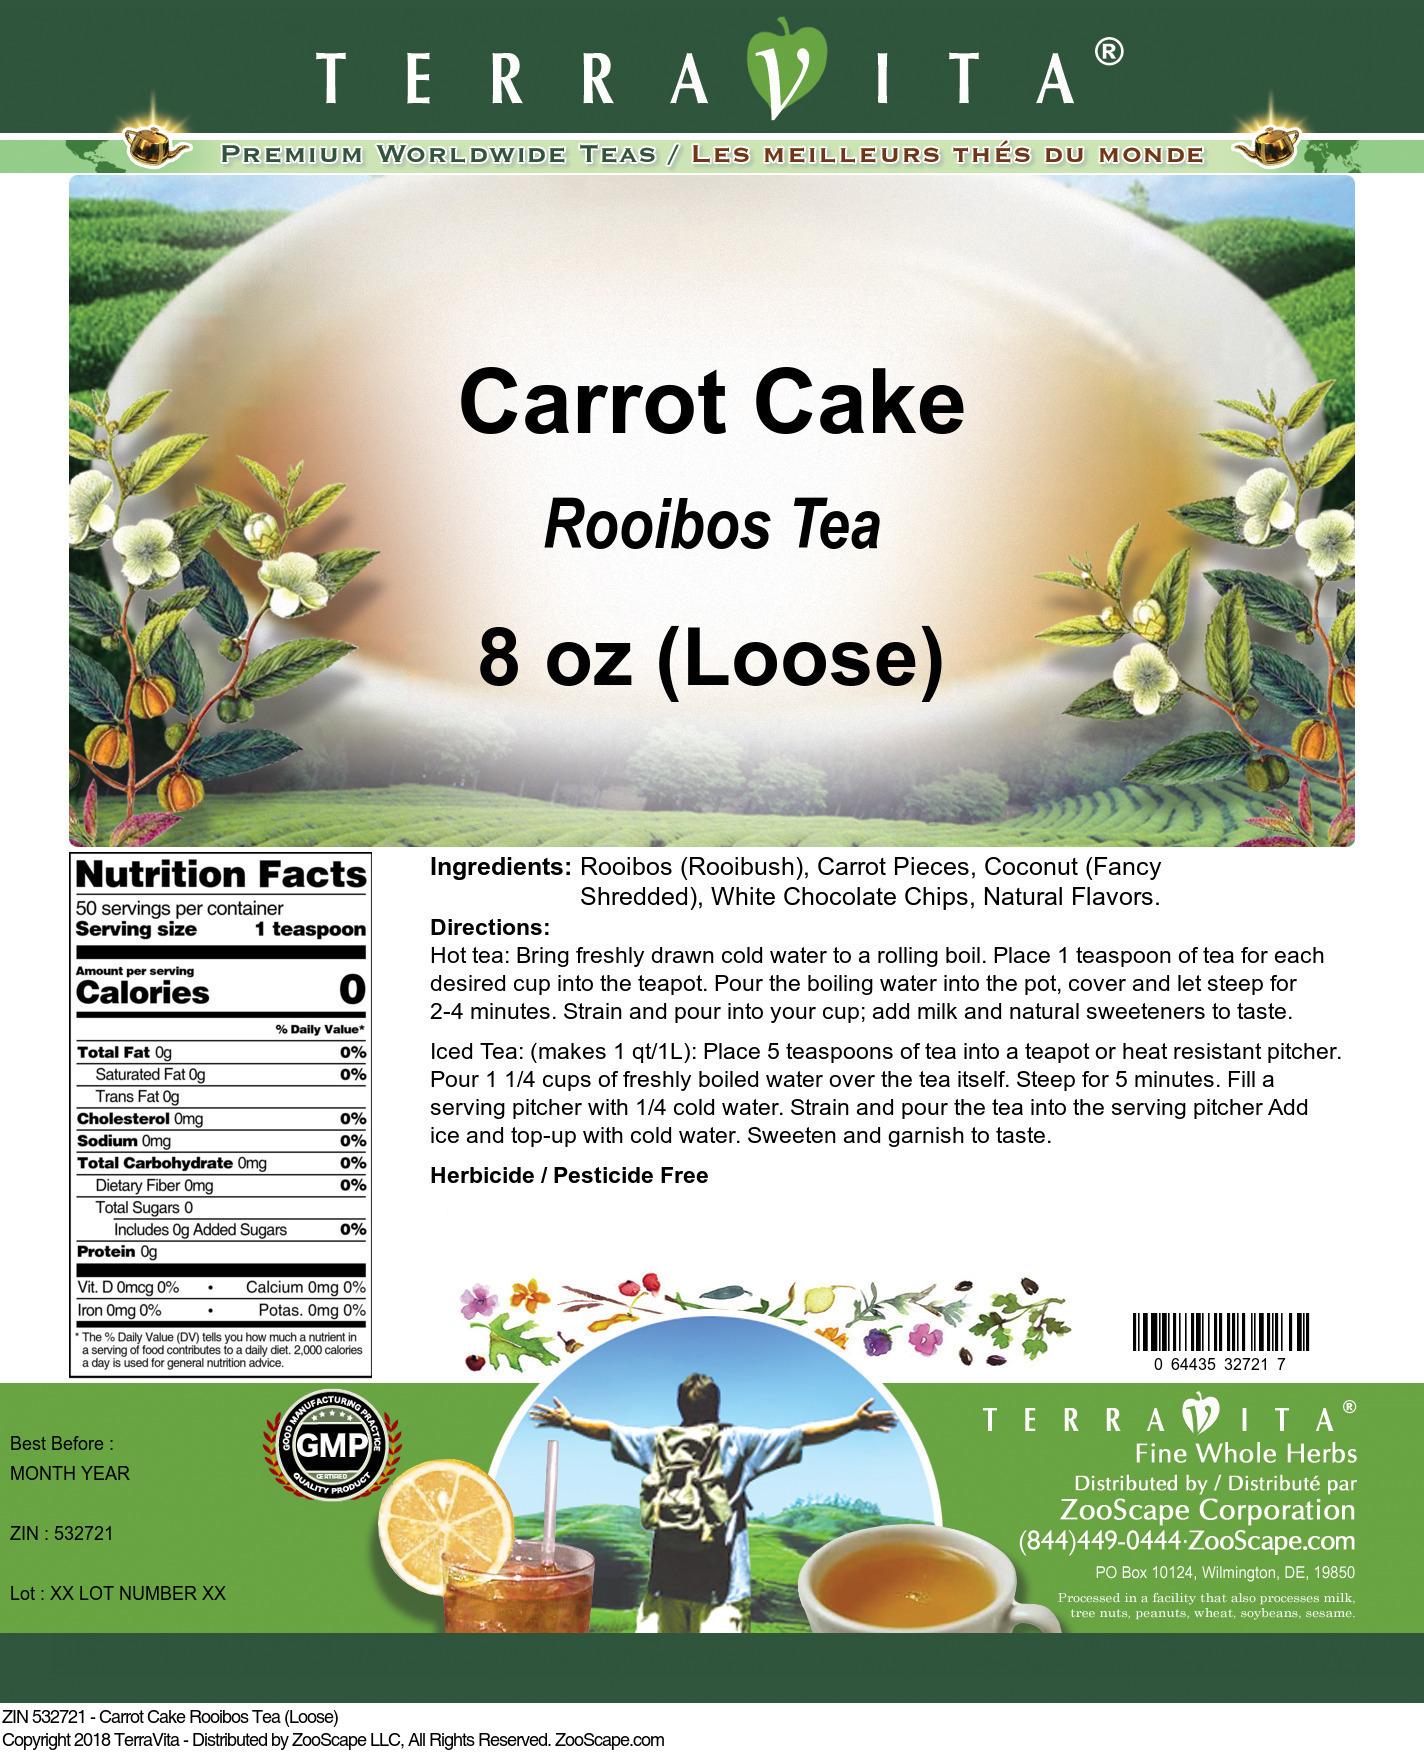 Carrot Cake Rooibos Tea (Loose)